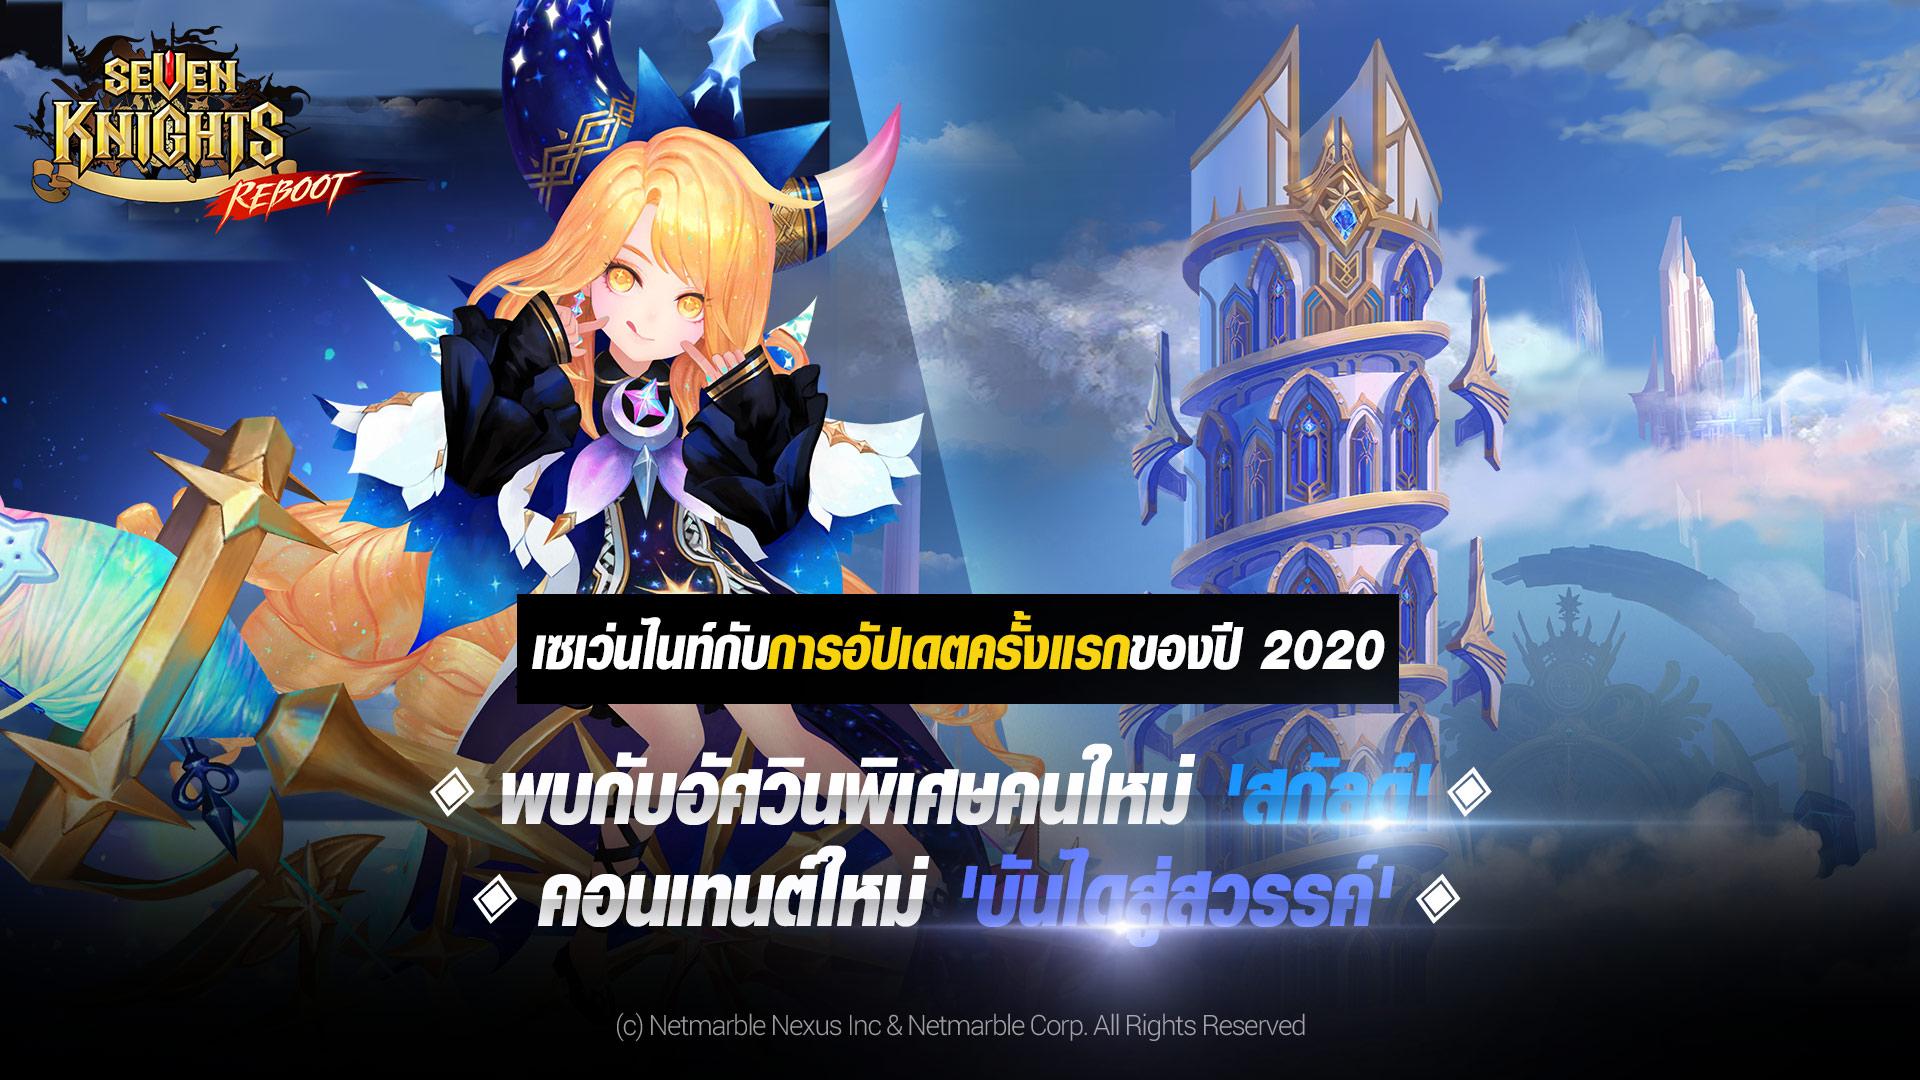 Seven Knights 912020 1